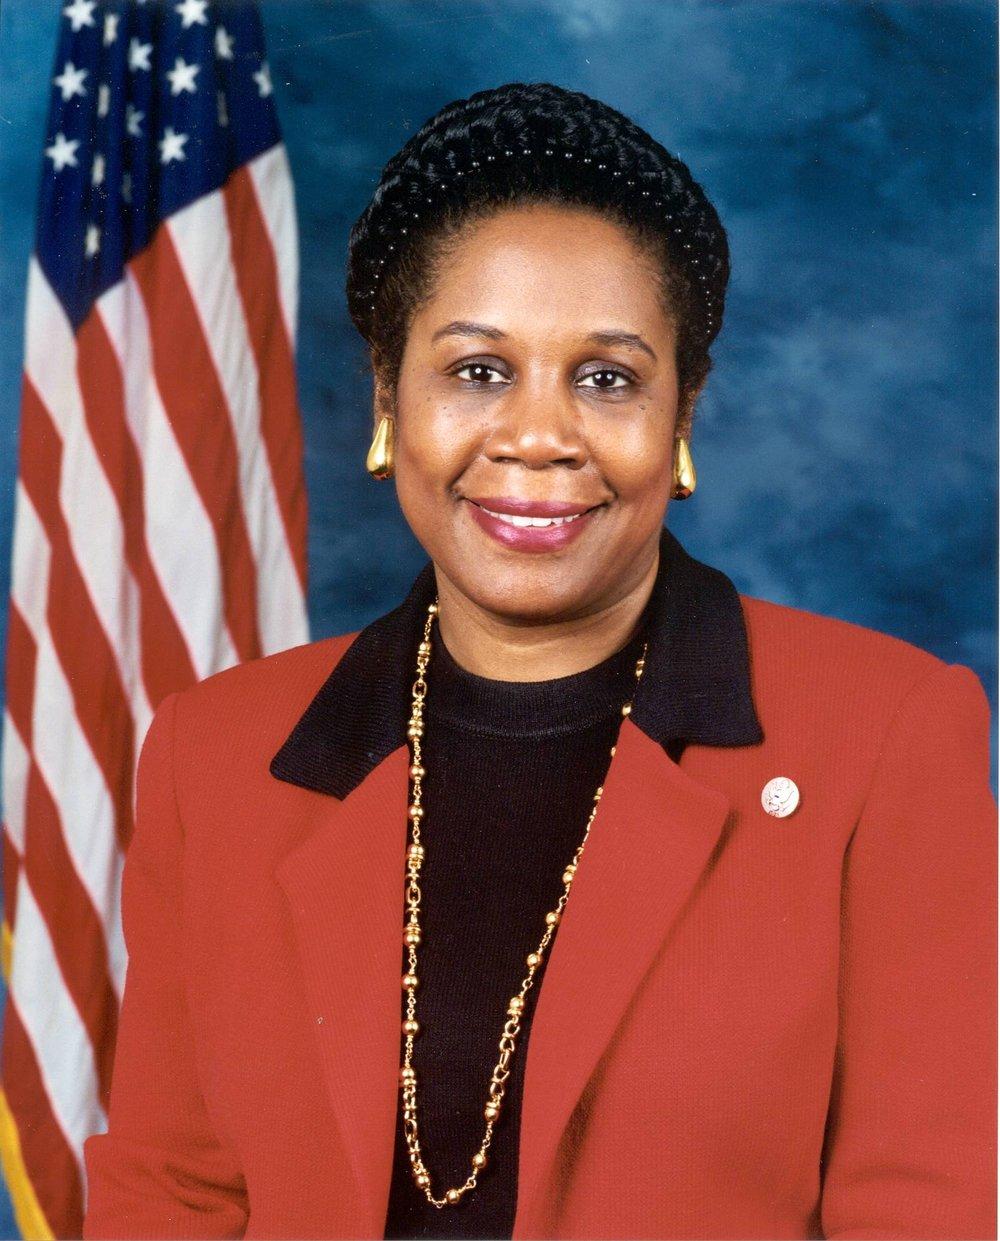 Rep. Sheila Jackson Lee (D-TX)